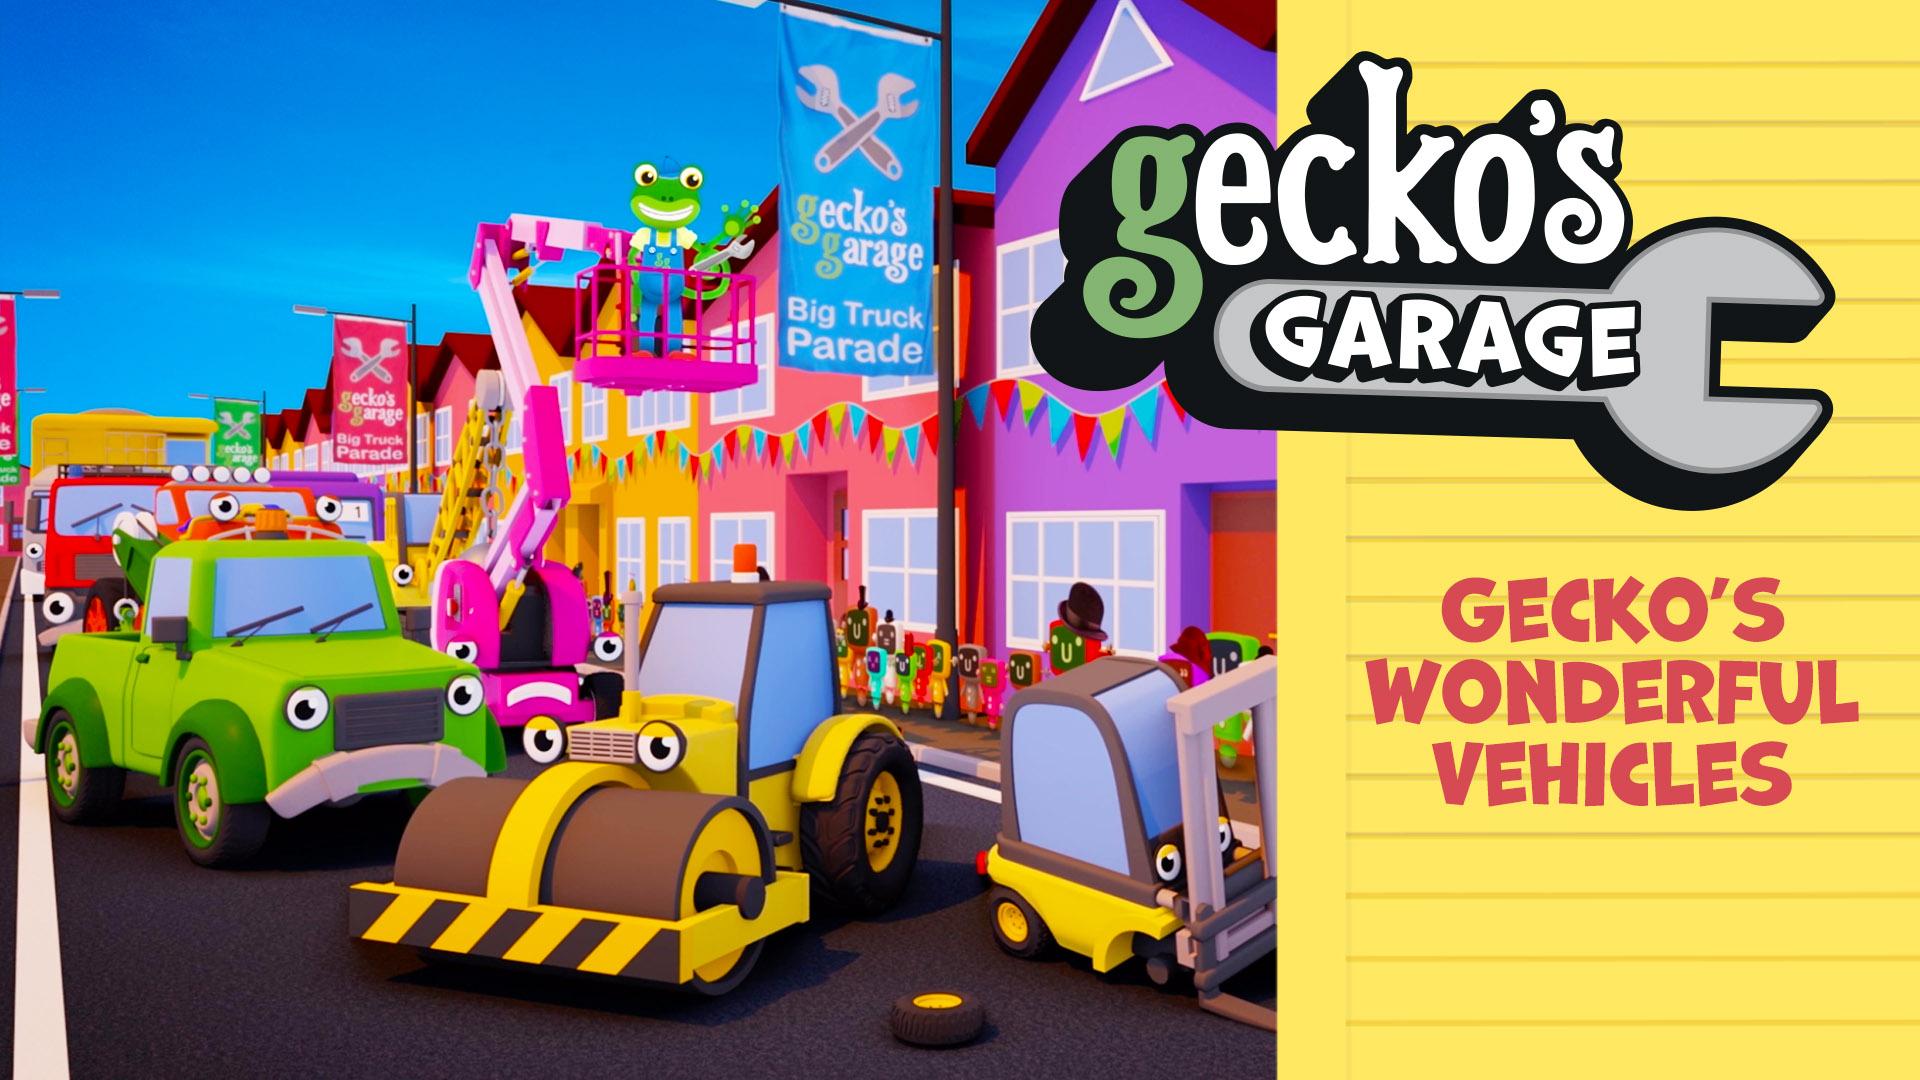 Gecko's Wonderful Vehicles